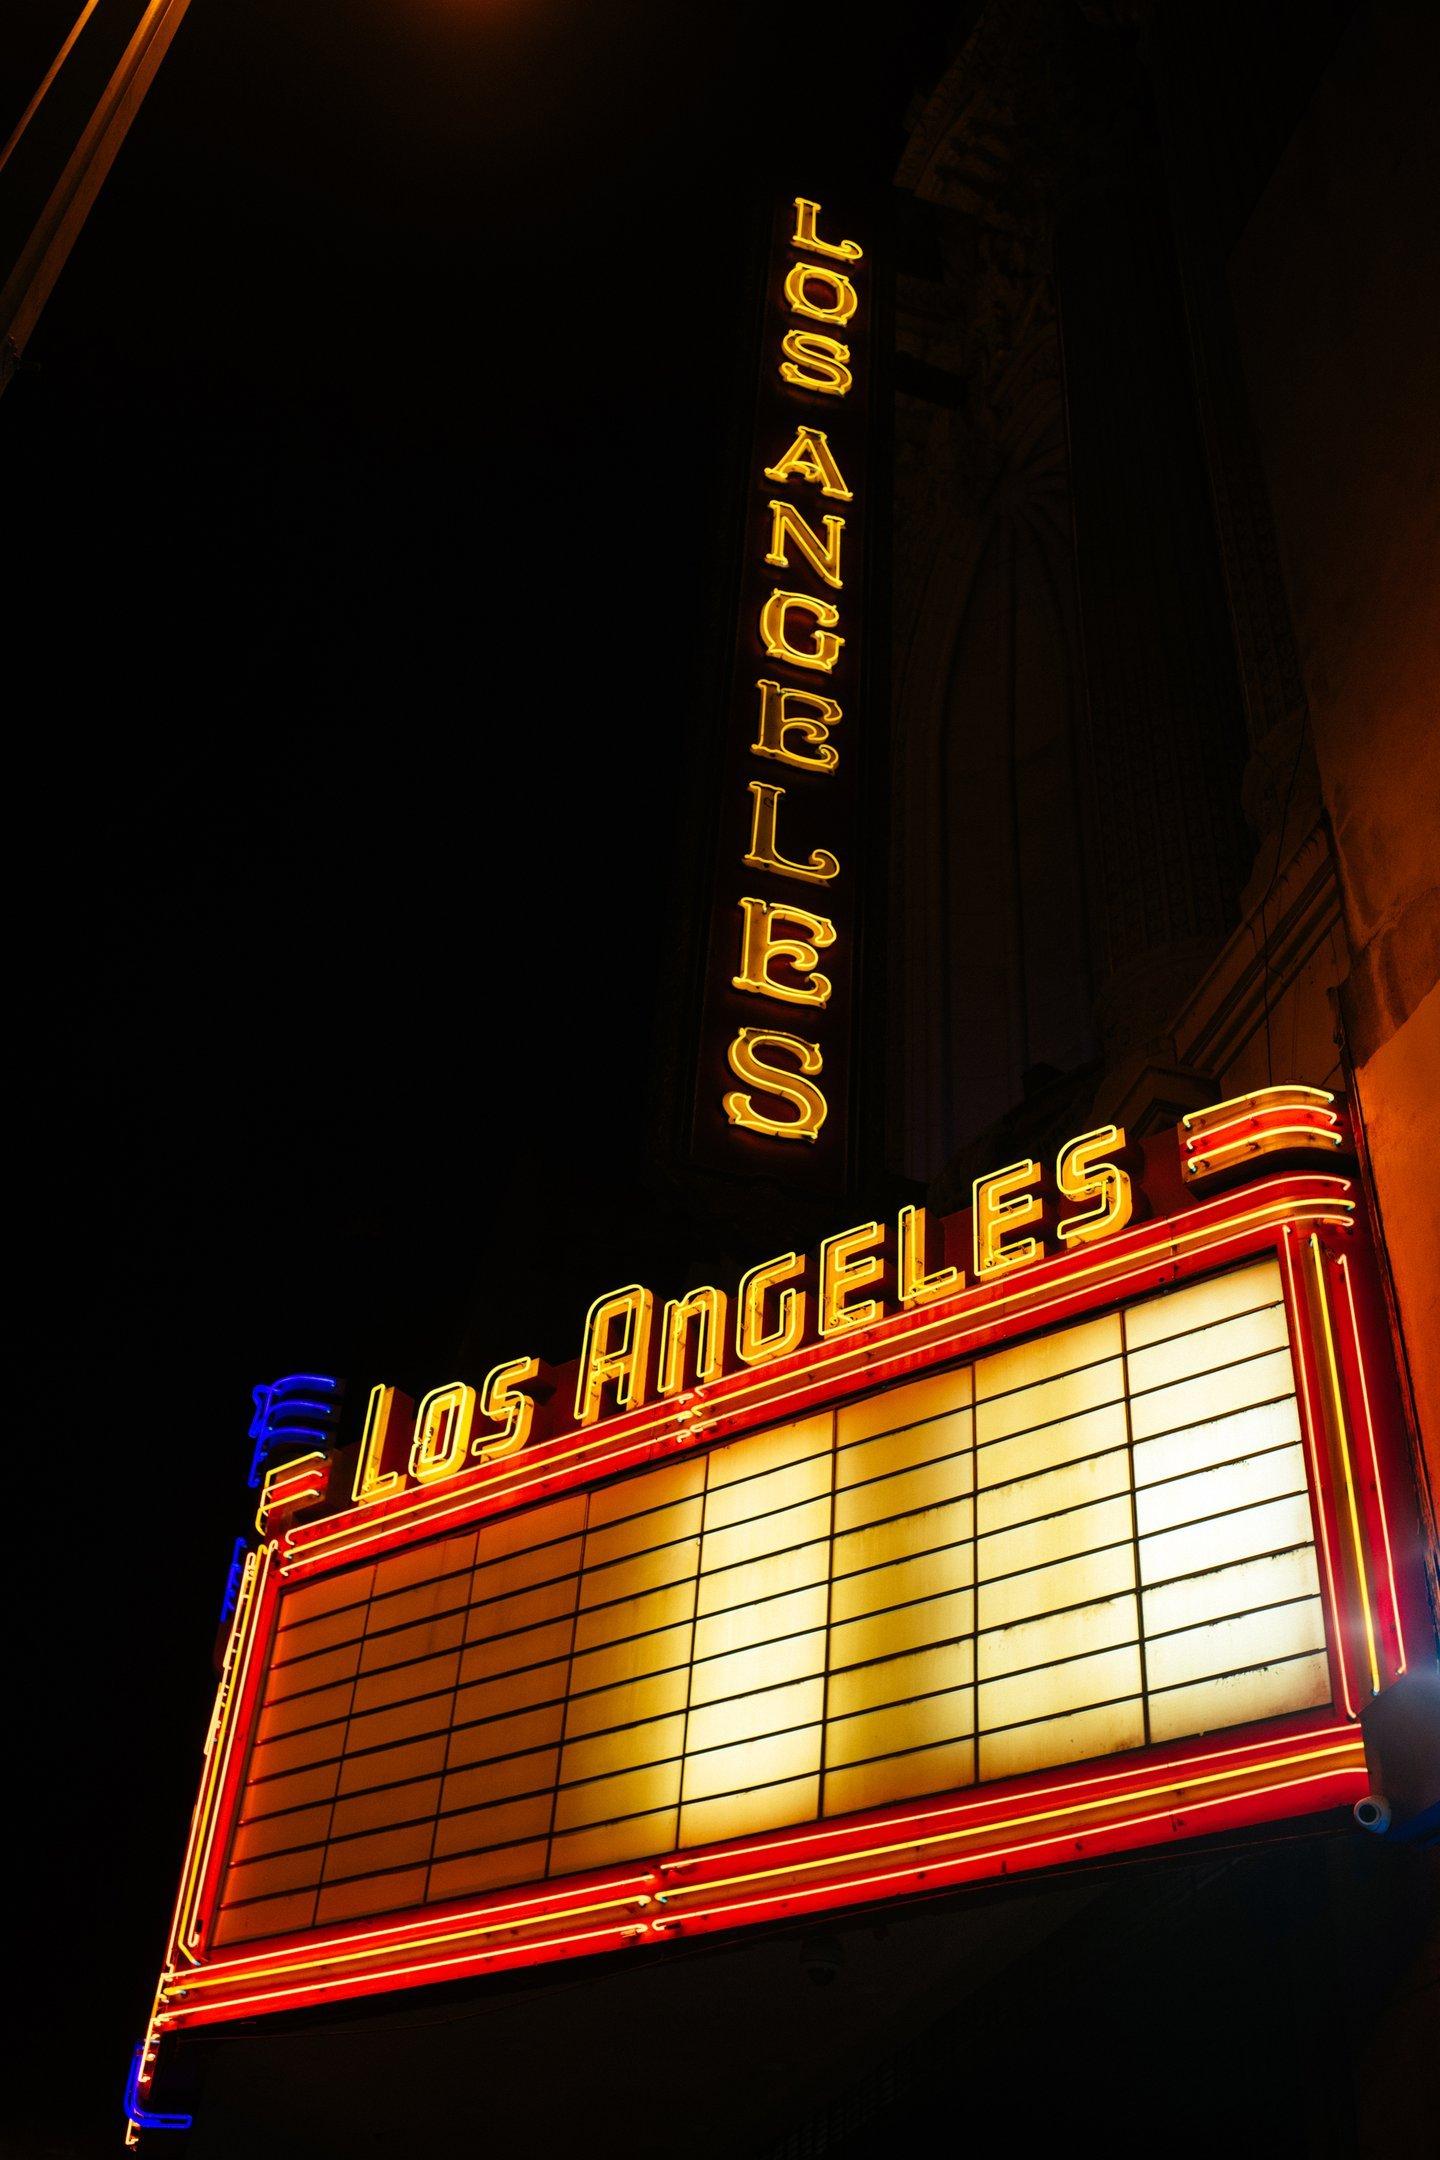 Los Angeles Theater, em Los Angeles